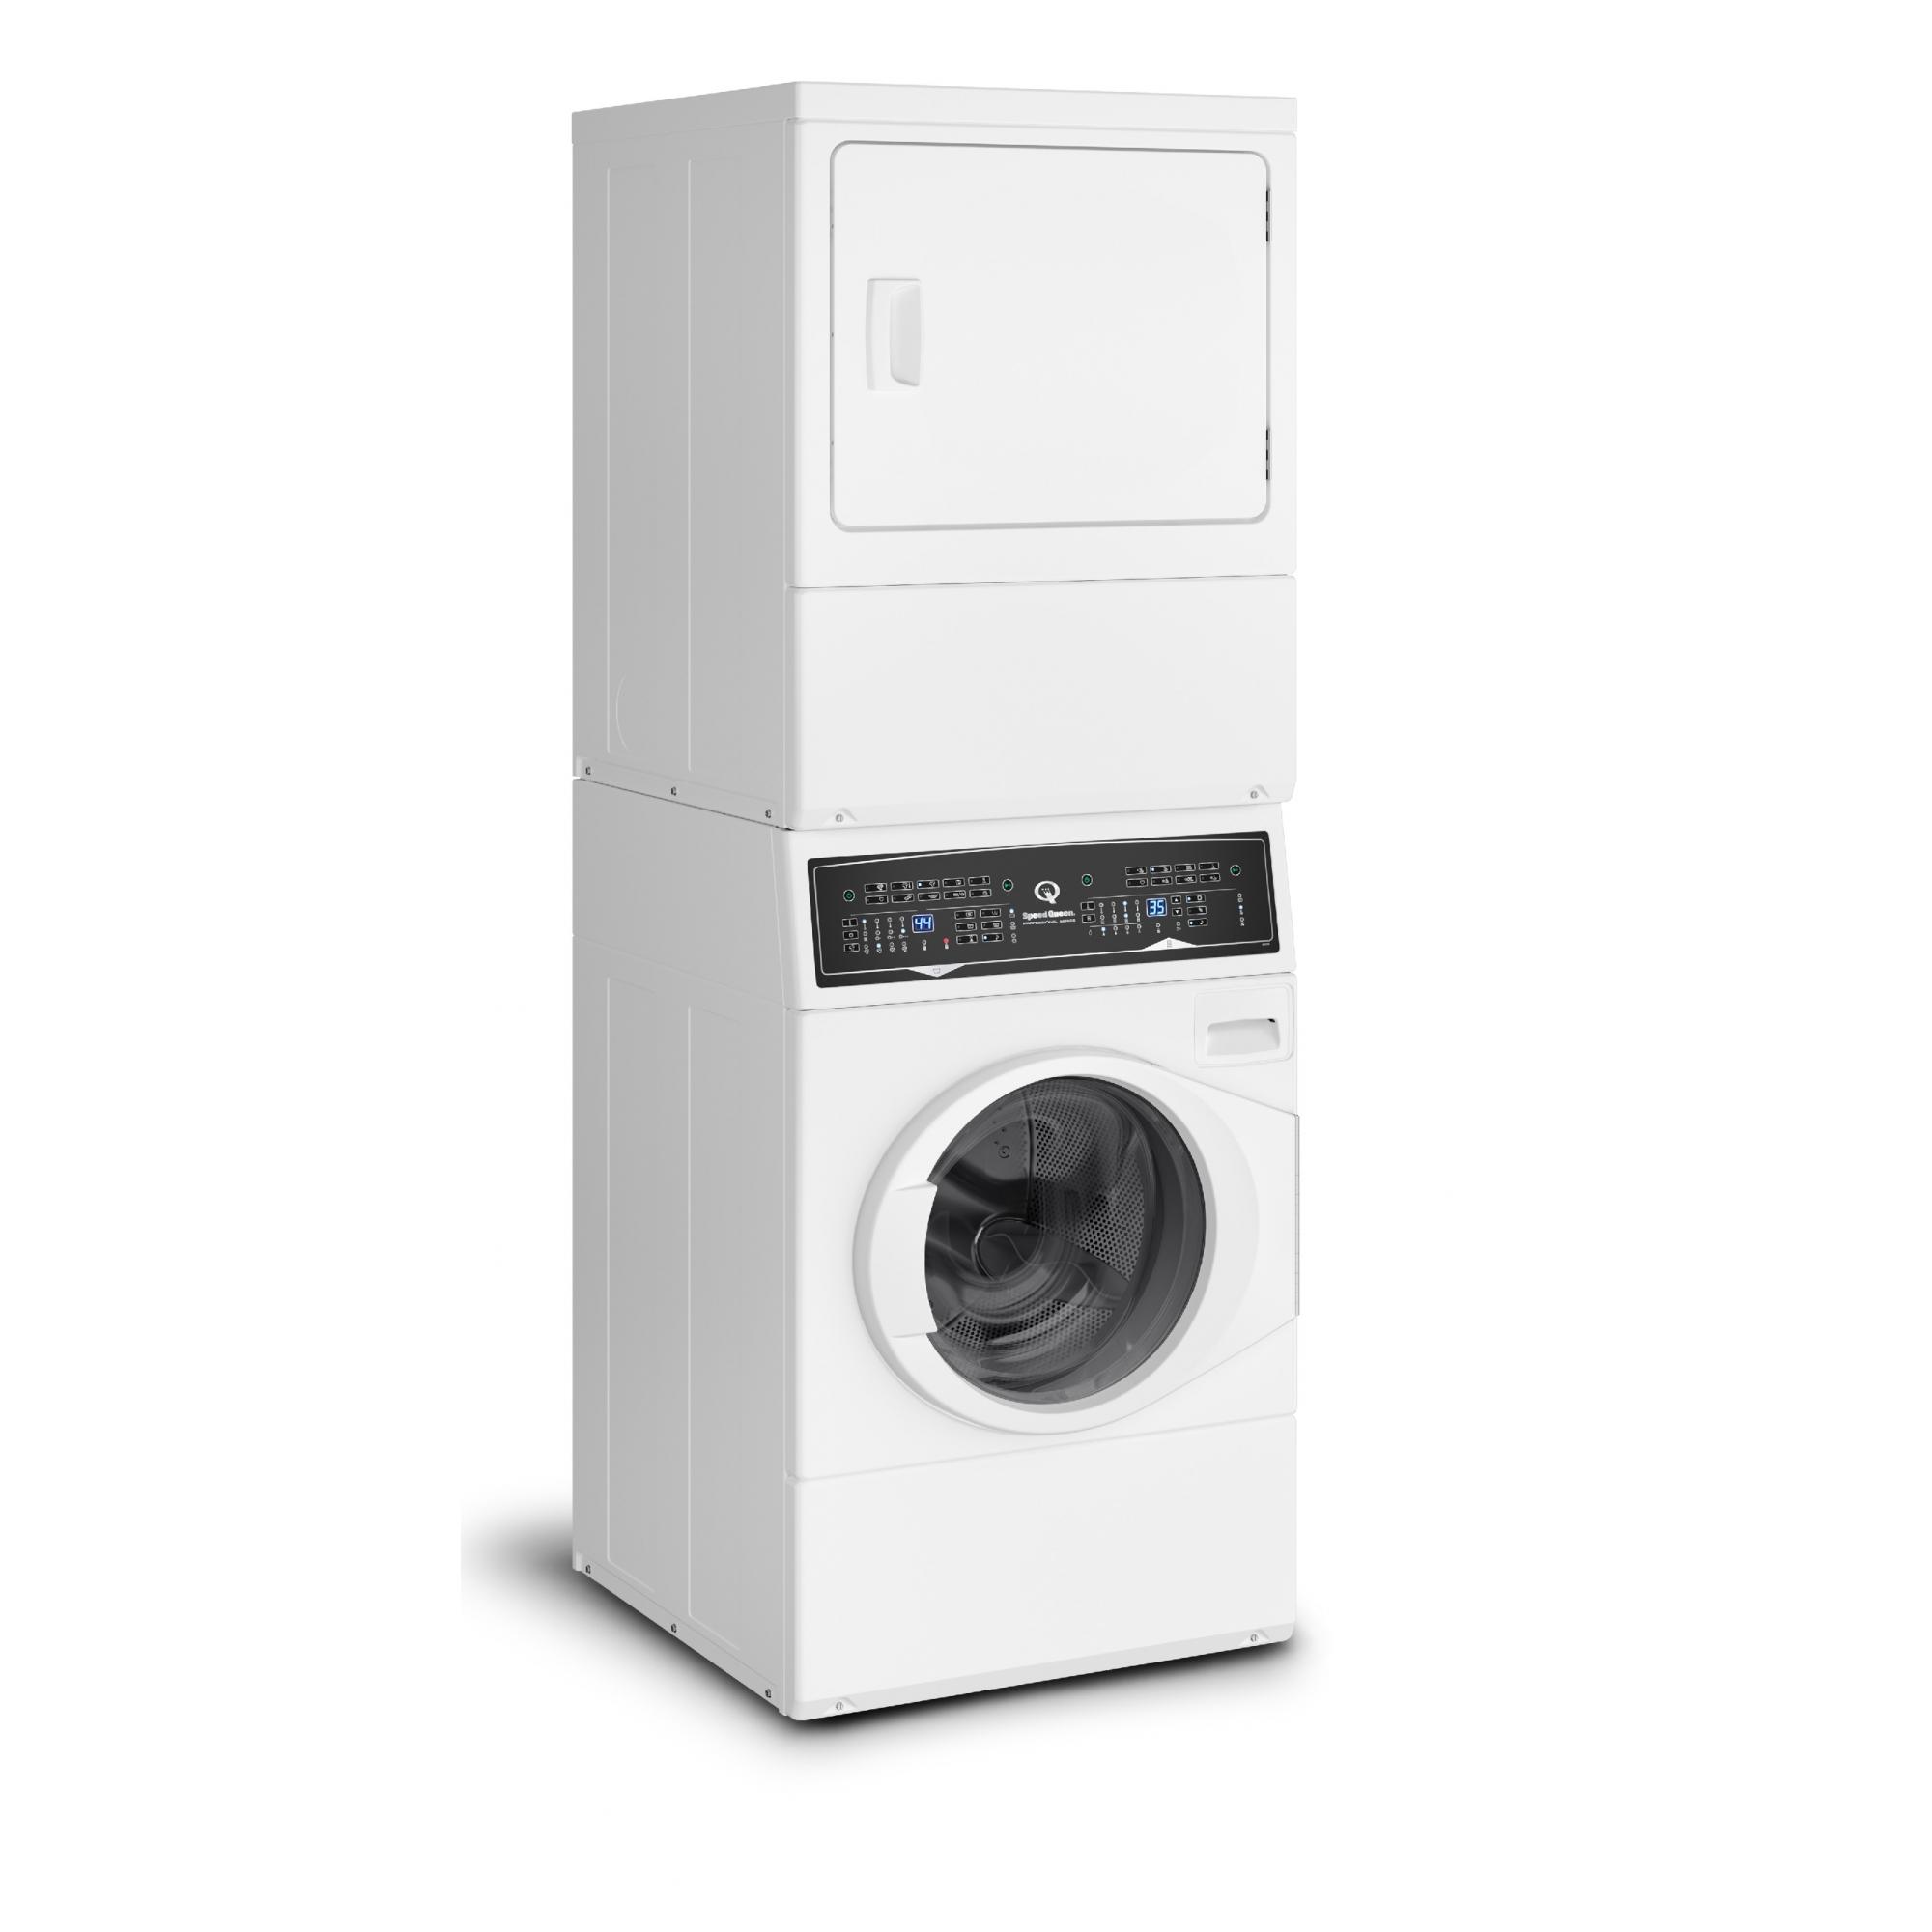 Lavadora e Secadora Elétrica de Roupas Speed Queen 10,5 Kg Branca